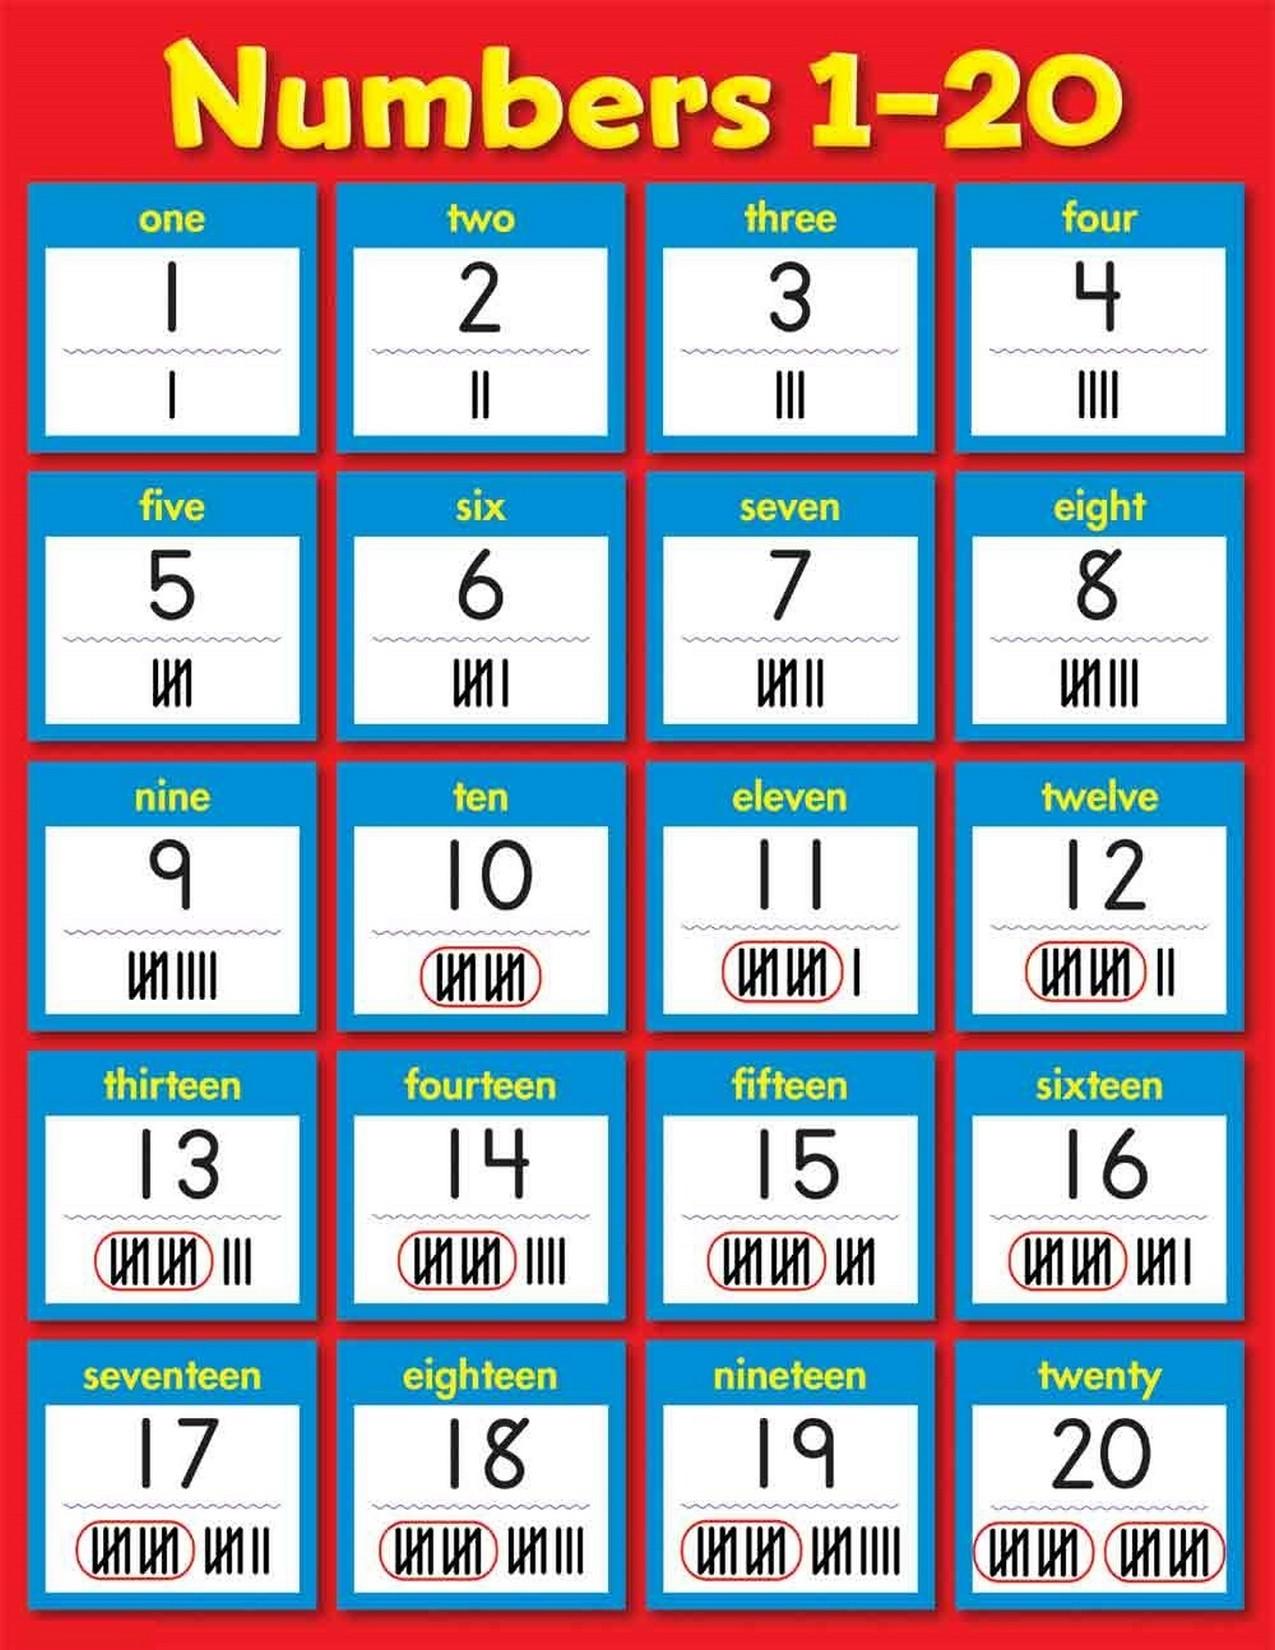 numbers 1-20 printable page